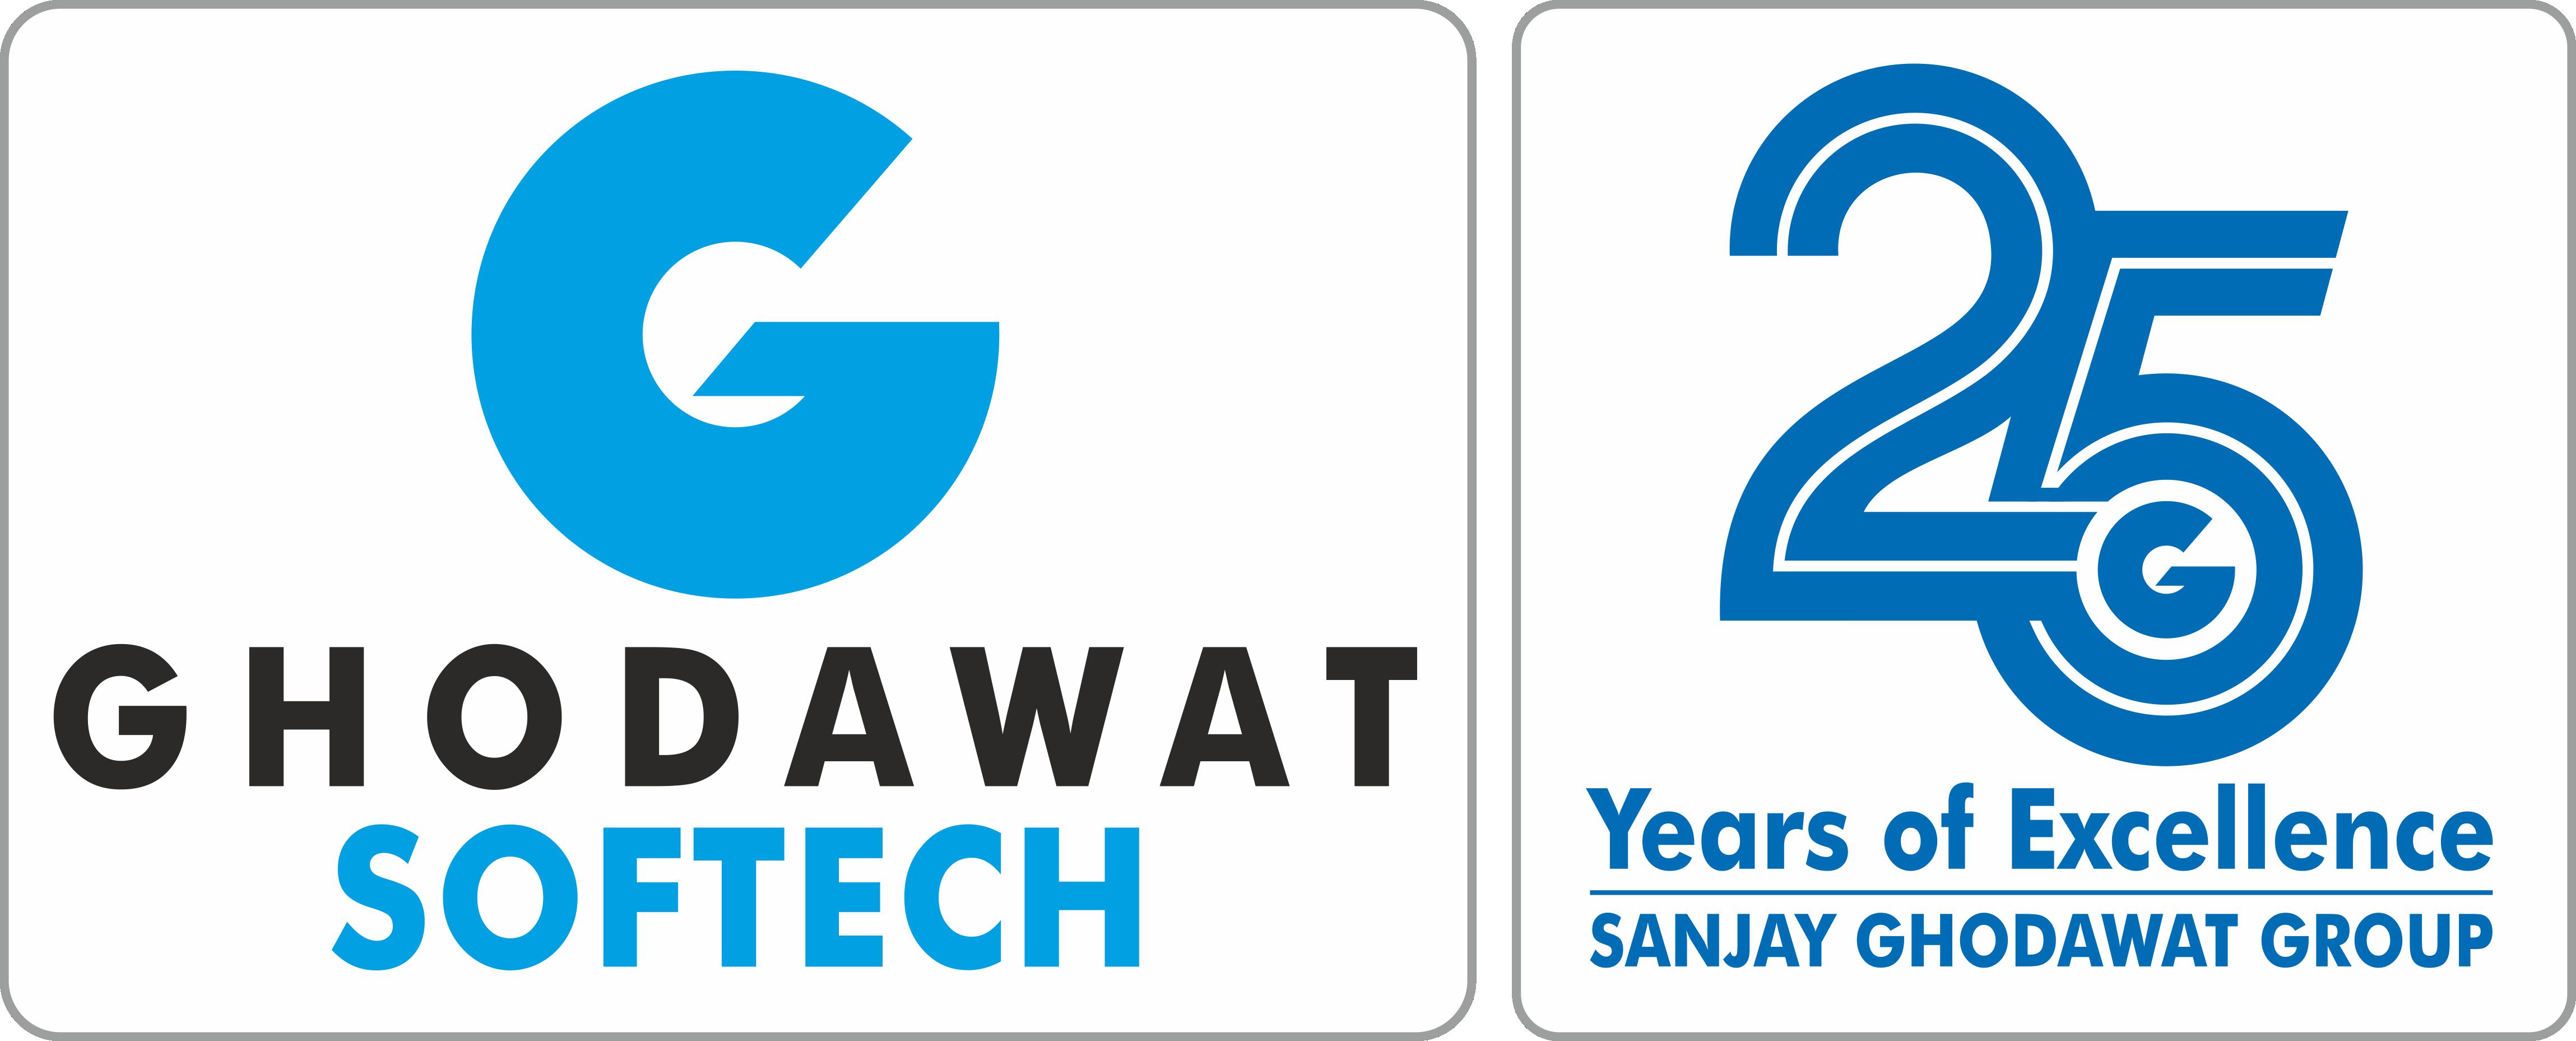 Ghodawat Softech